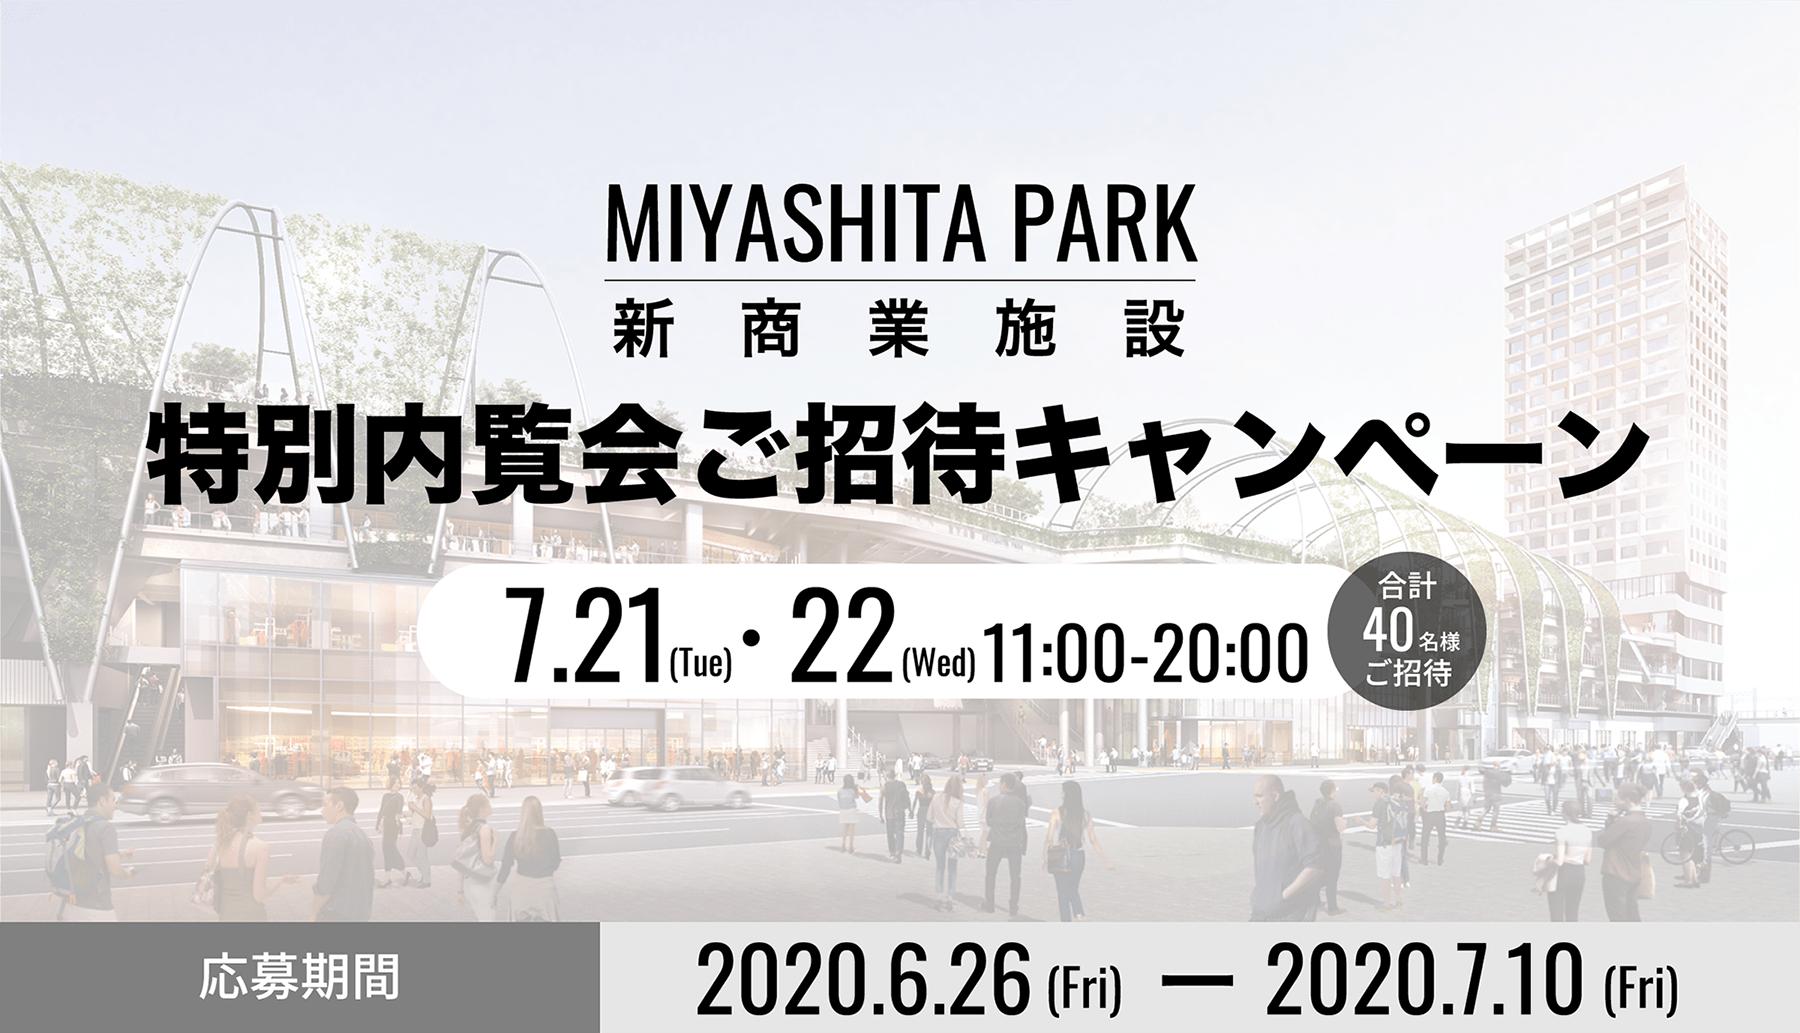 MIYASHITA PARK 特別内覧会ご招待キャンペーン 応募期間:2020.6.26-7.10